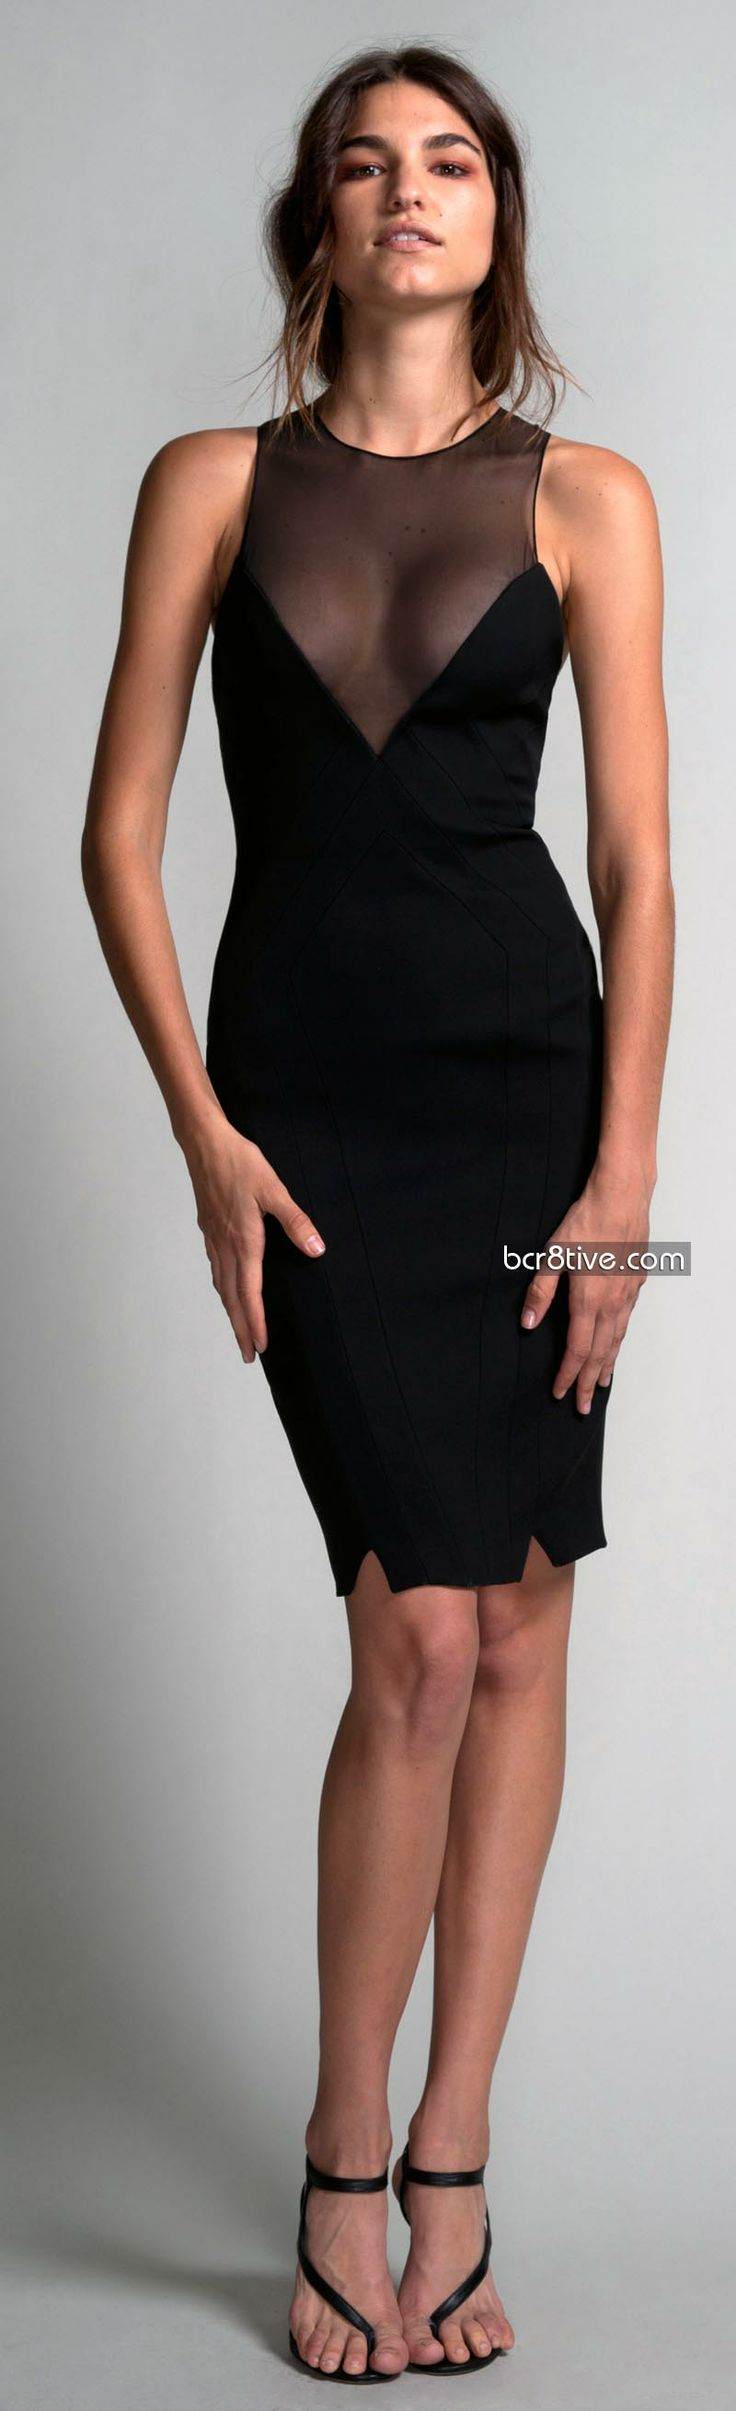 Hakaan fashion jot latest trends of fashion l b d pinterest